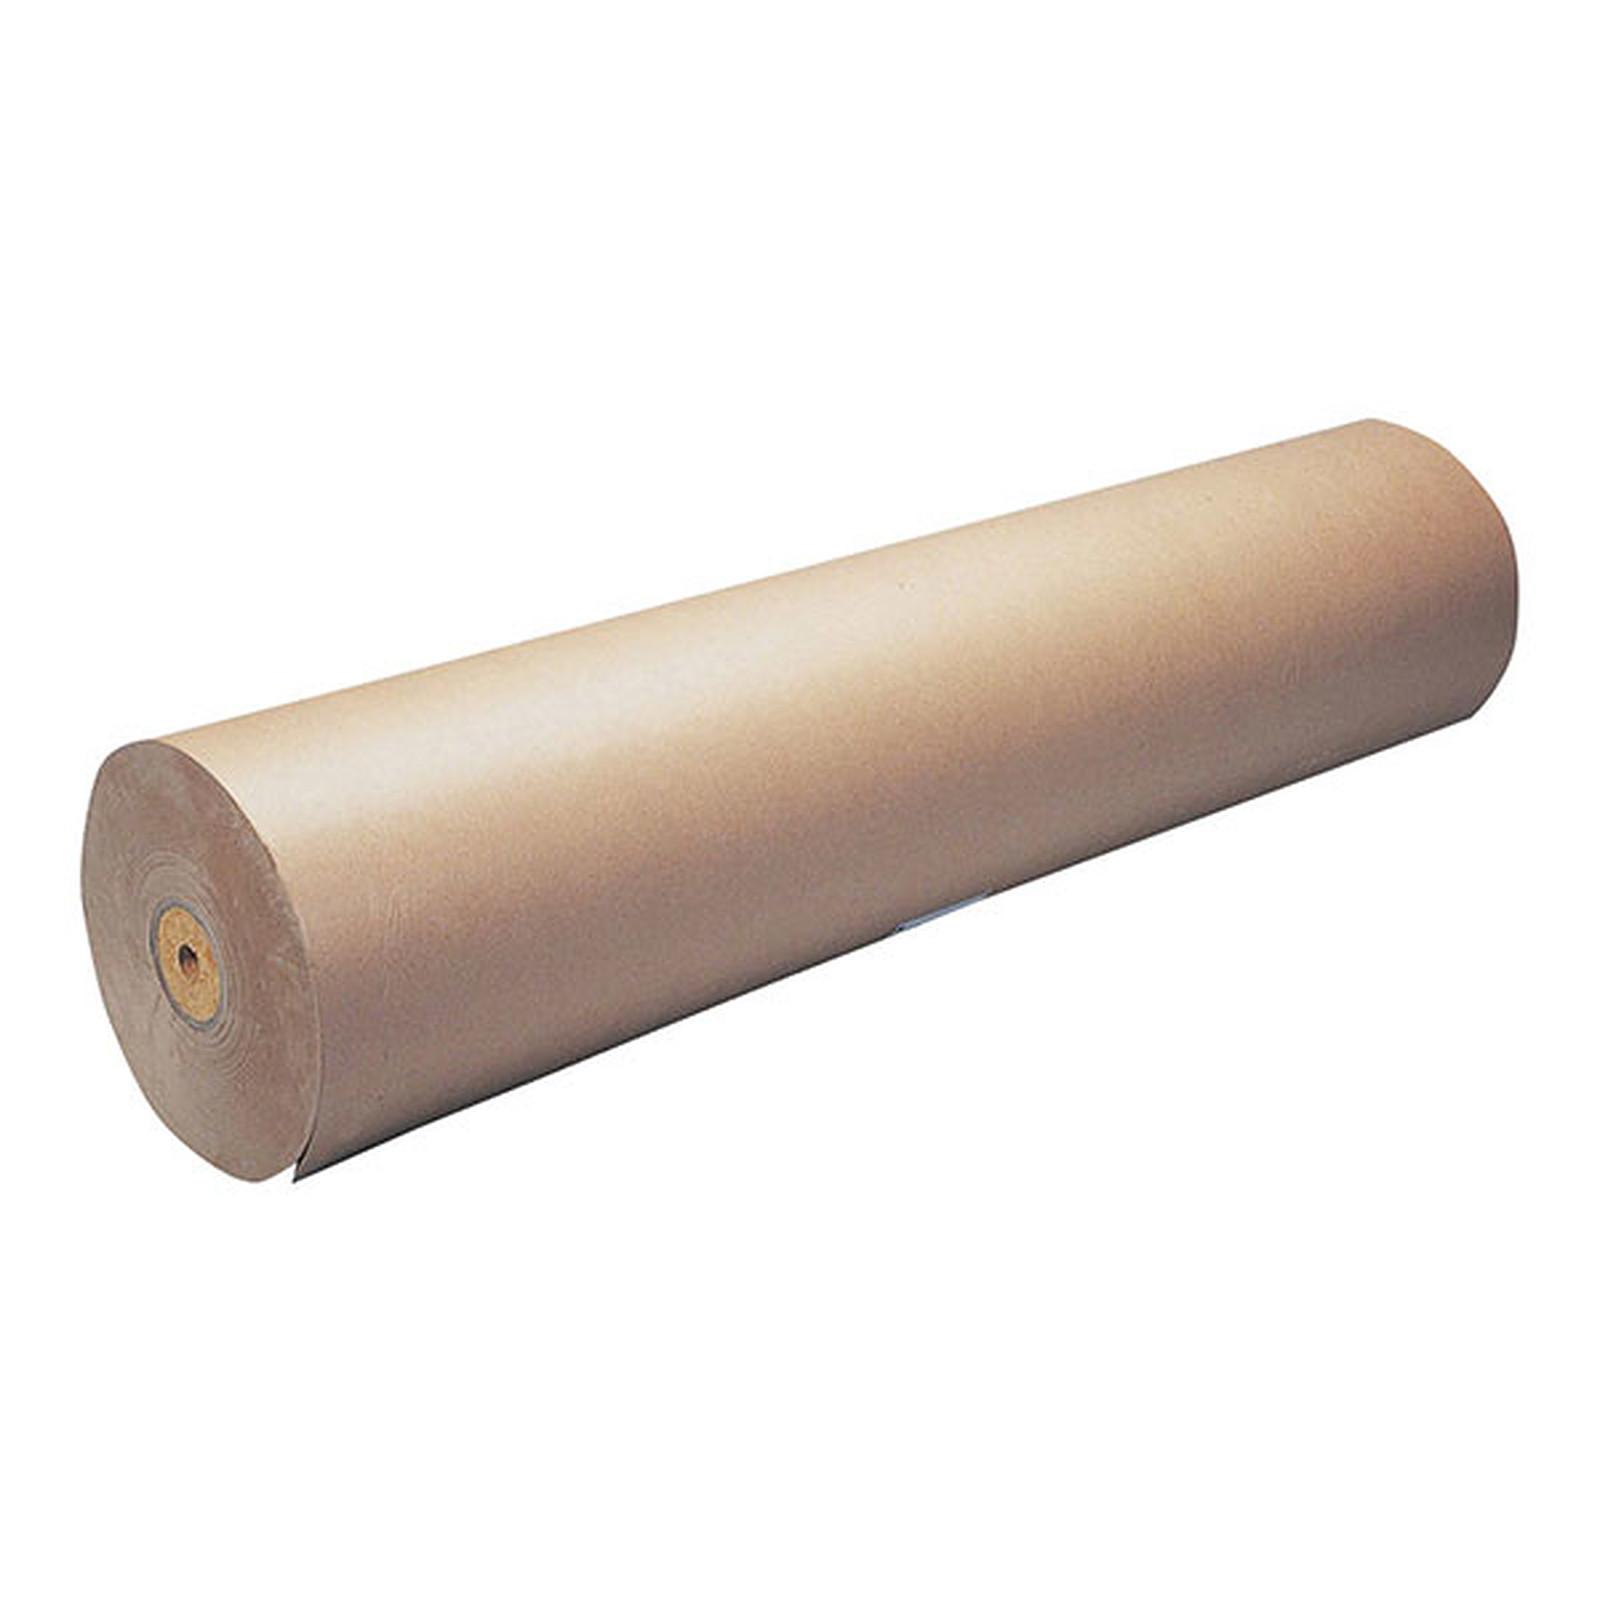 Bobine papier kraft brun 1m x 25m